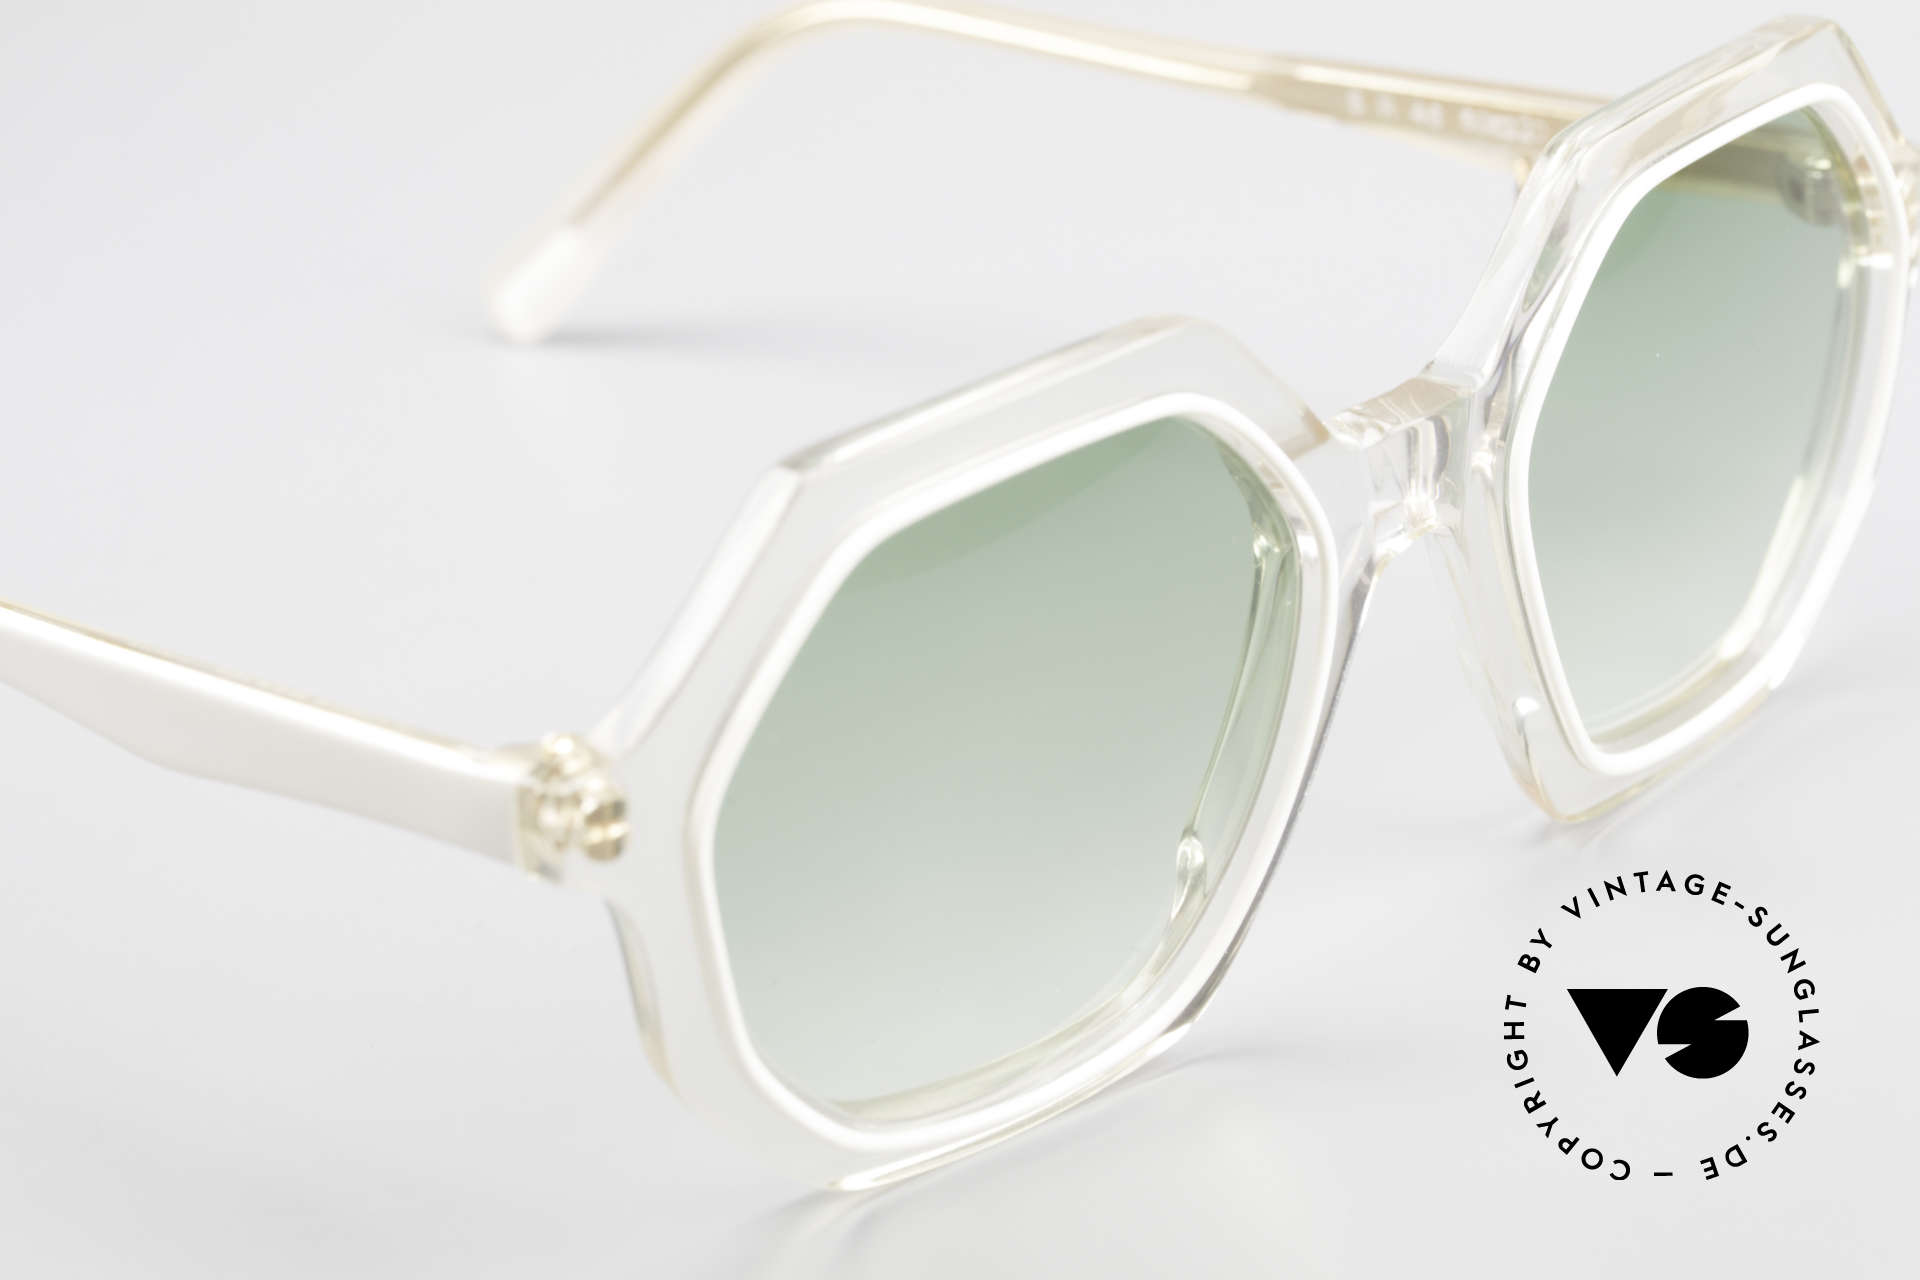 Sonia Rykiel SR46 444 Octagonal Sunglasses 1970's, NO RETRO fashion, but a genuine 40 years old unicum, Made for Women